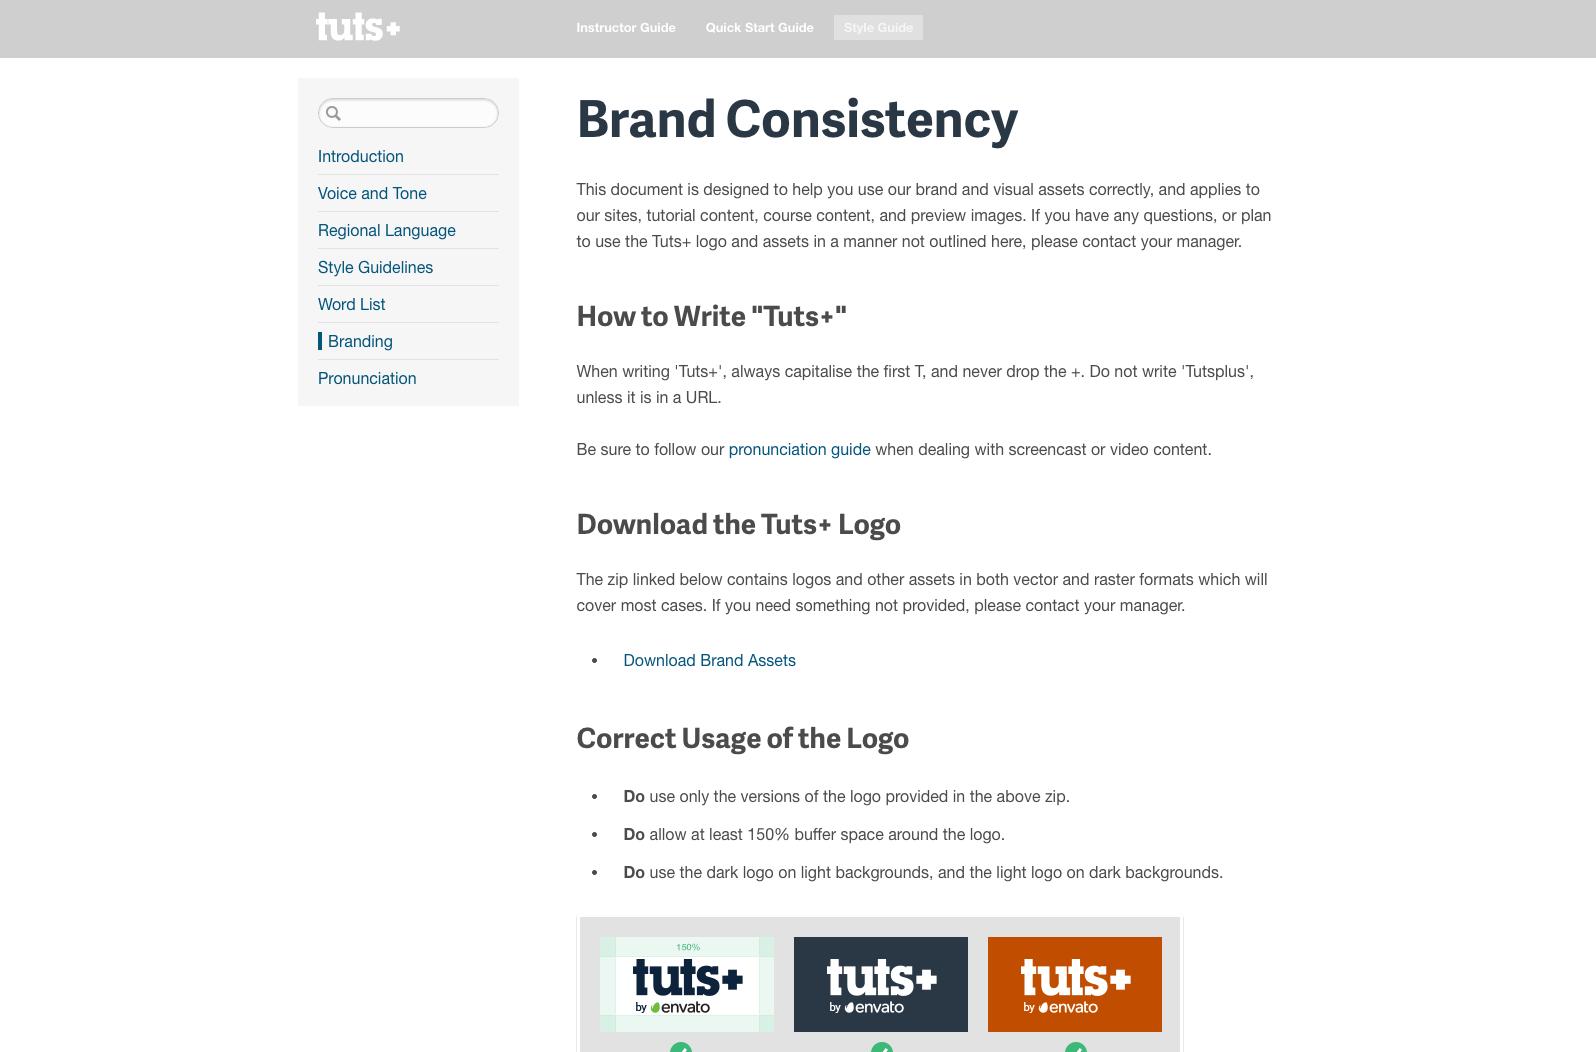 Tuts+-guidelines | web-crunch.com